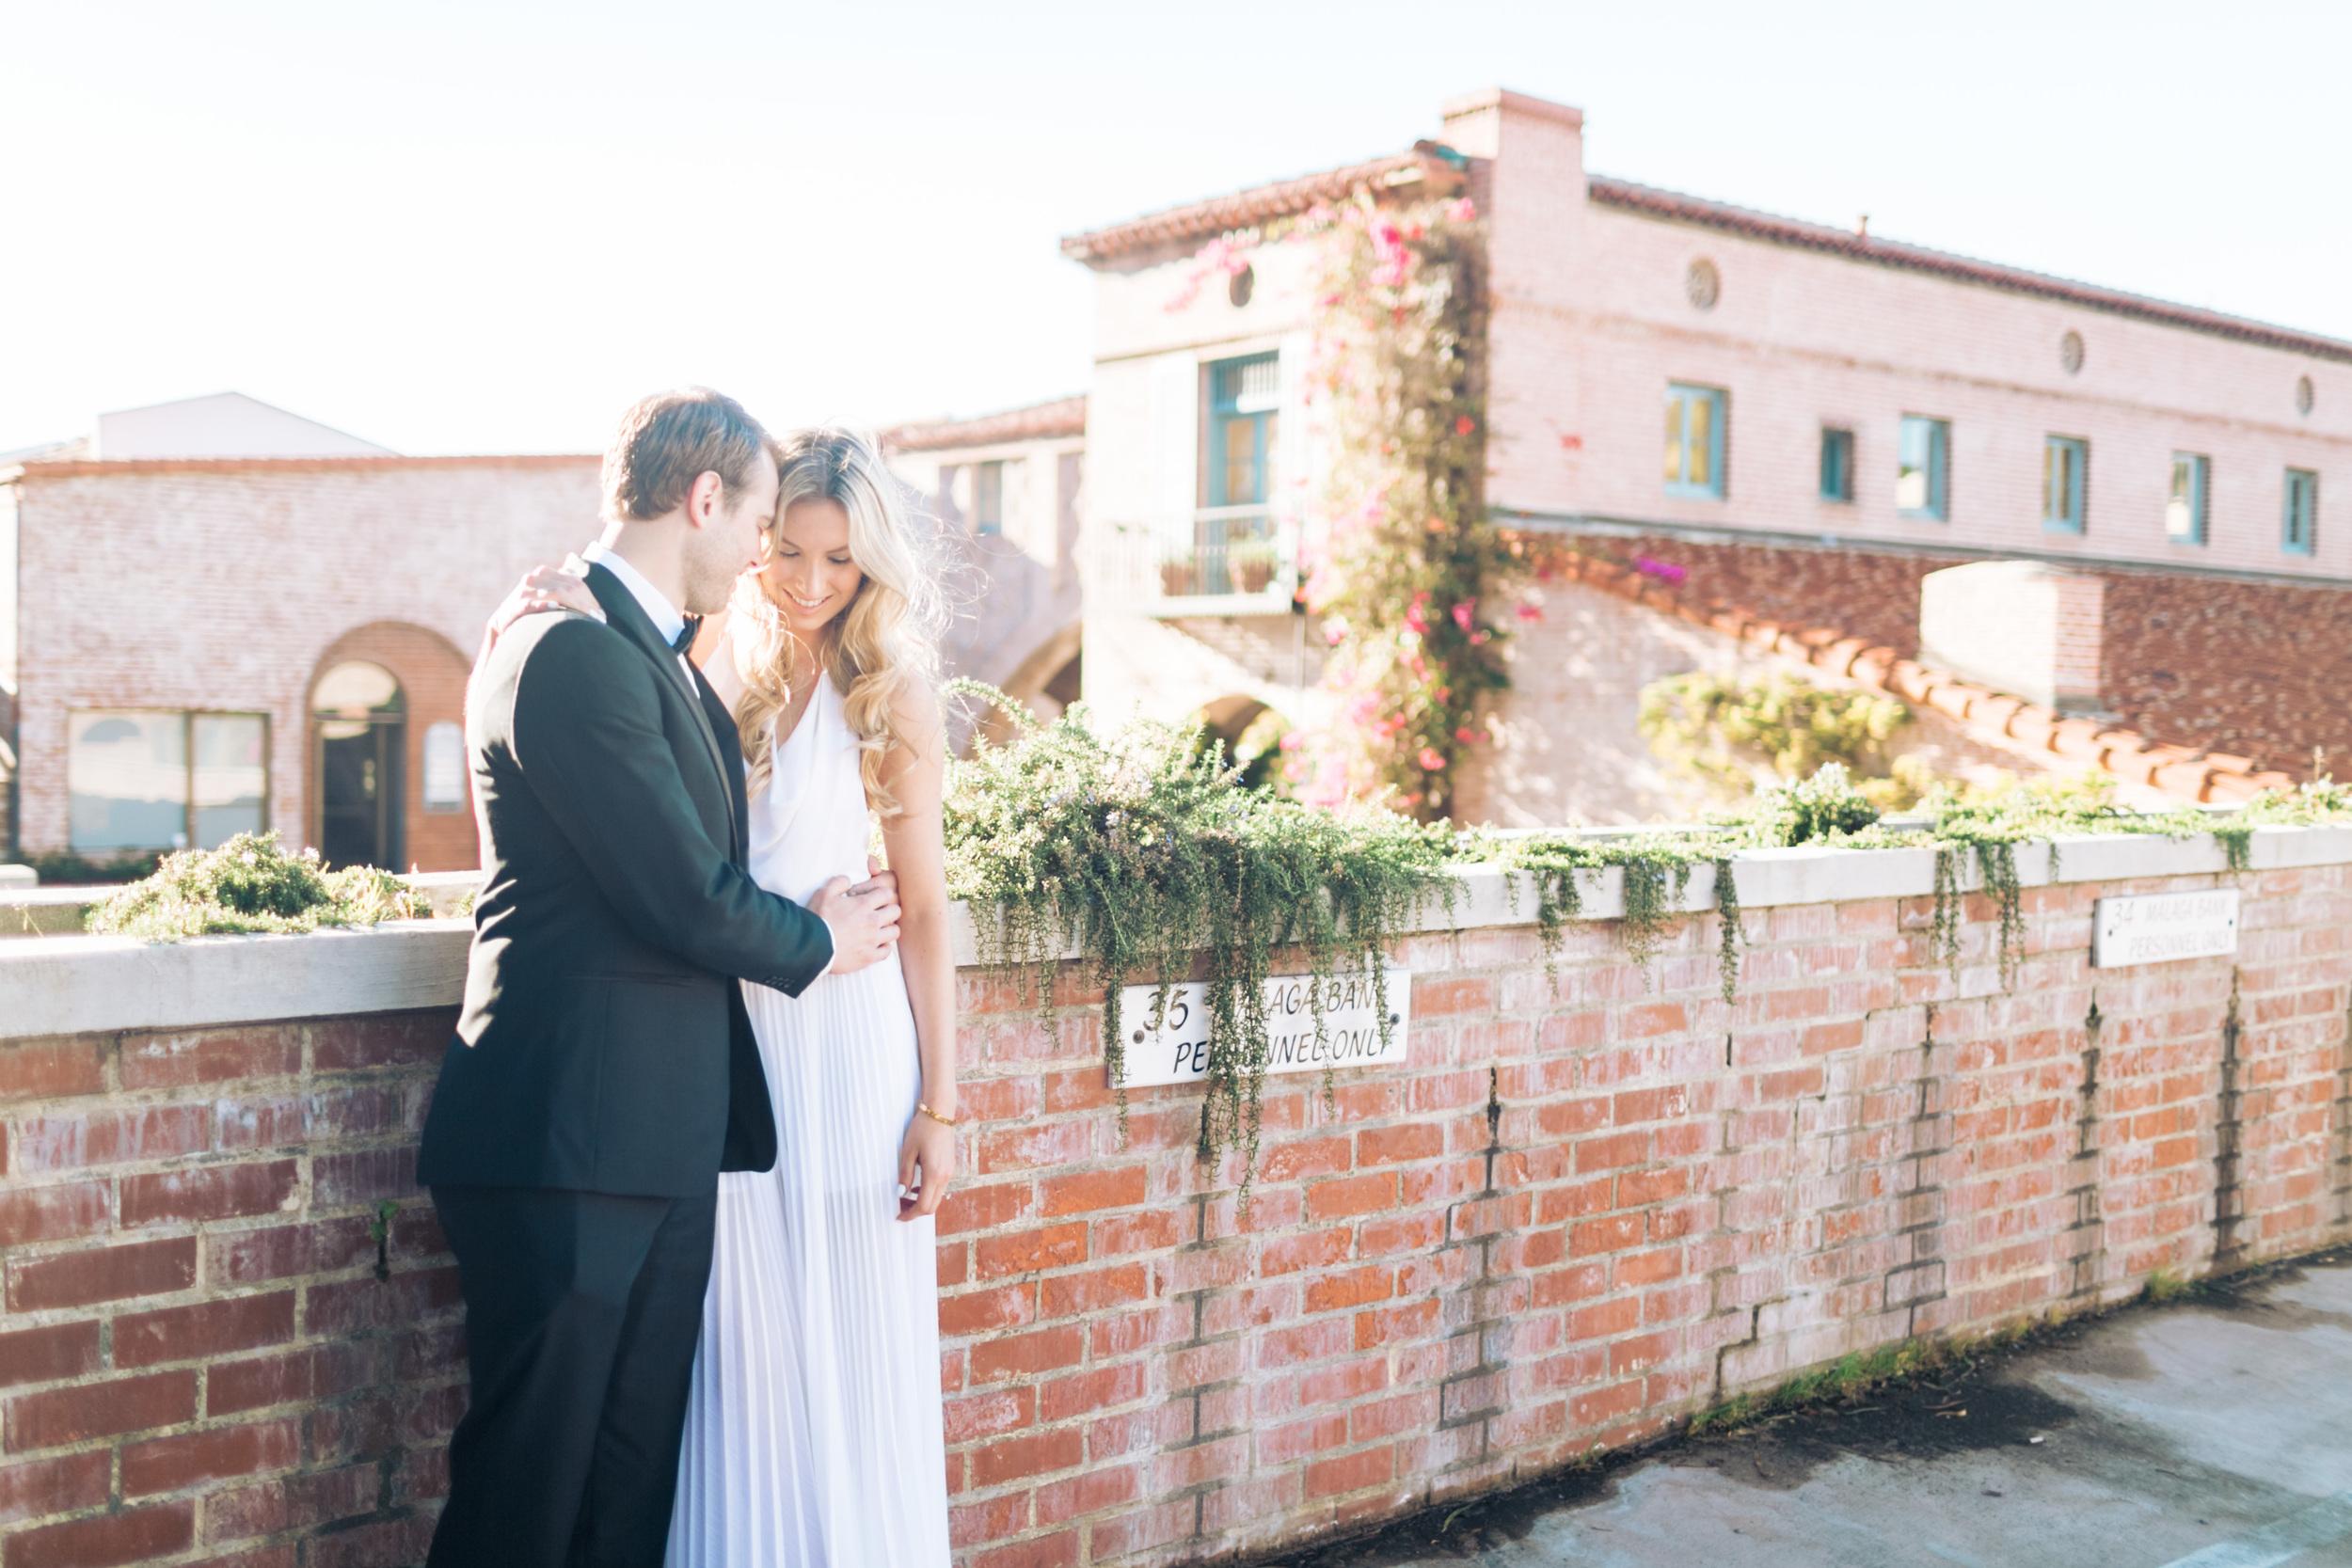 2015Natalie Schutt Photography- Palos Verdes Wedding-2.JPG